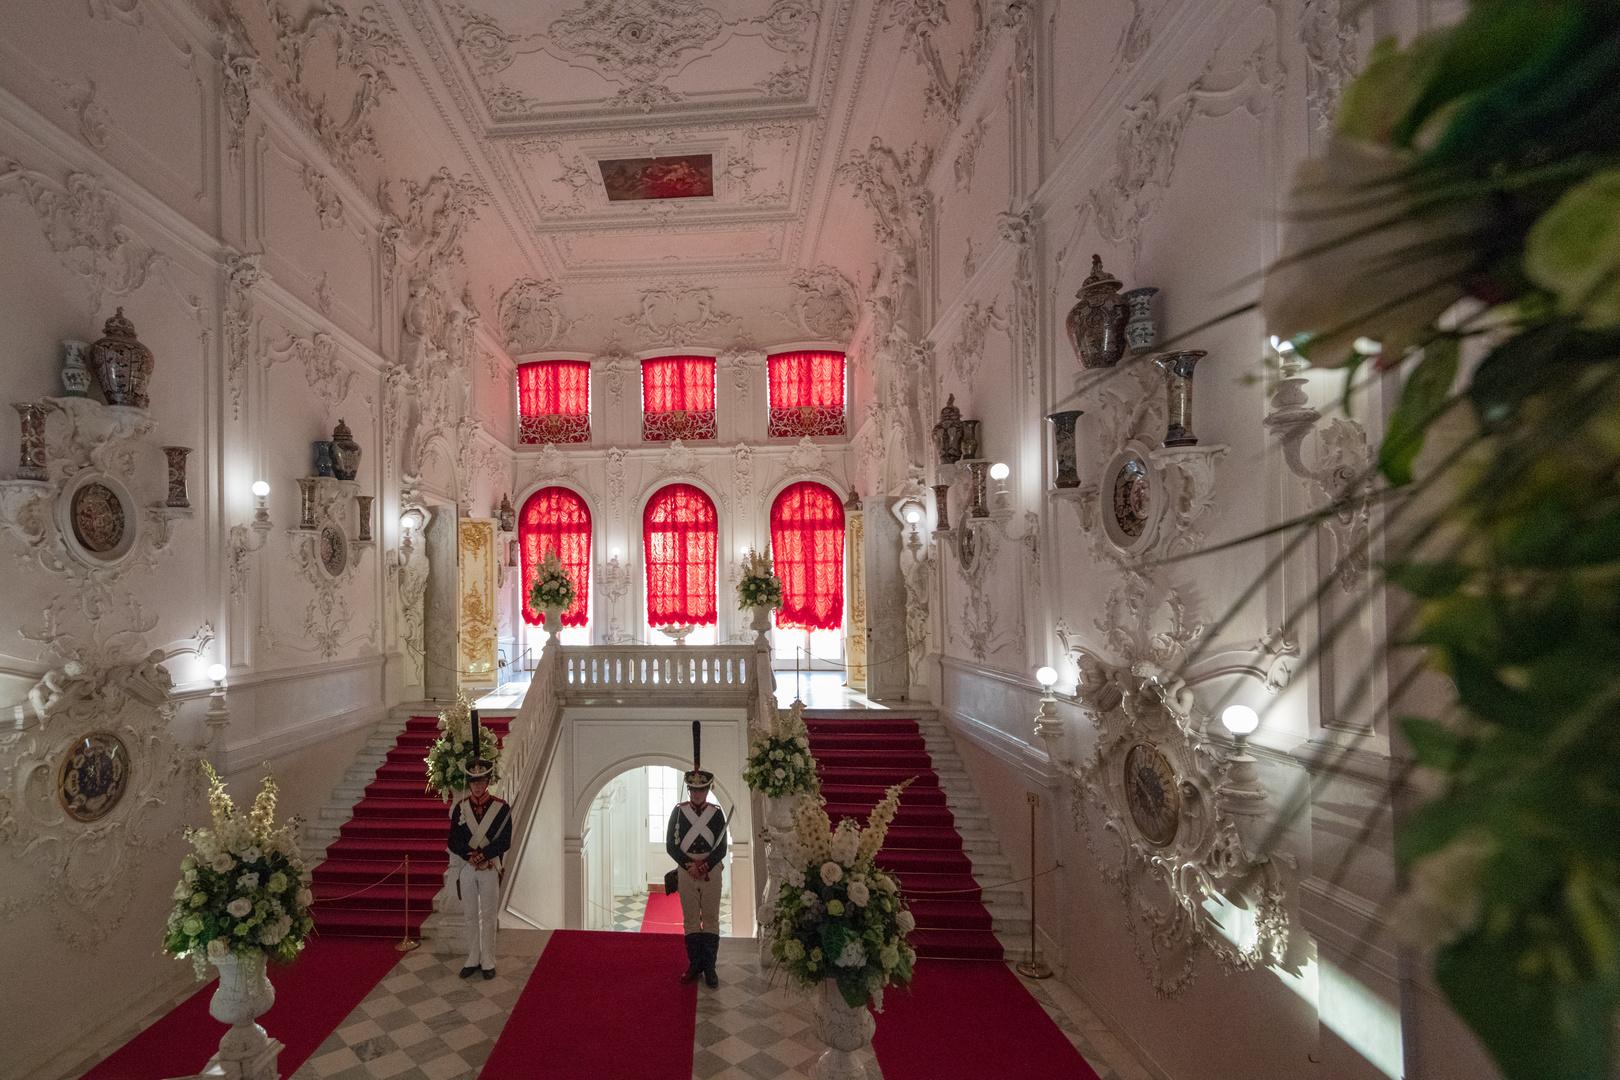 Eingang zum Katharinenpalast